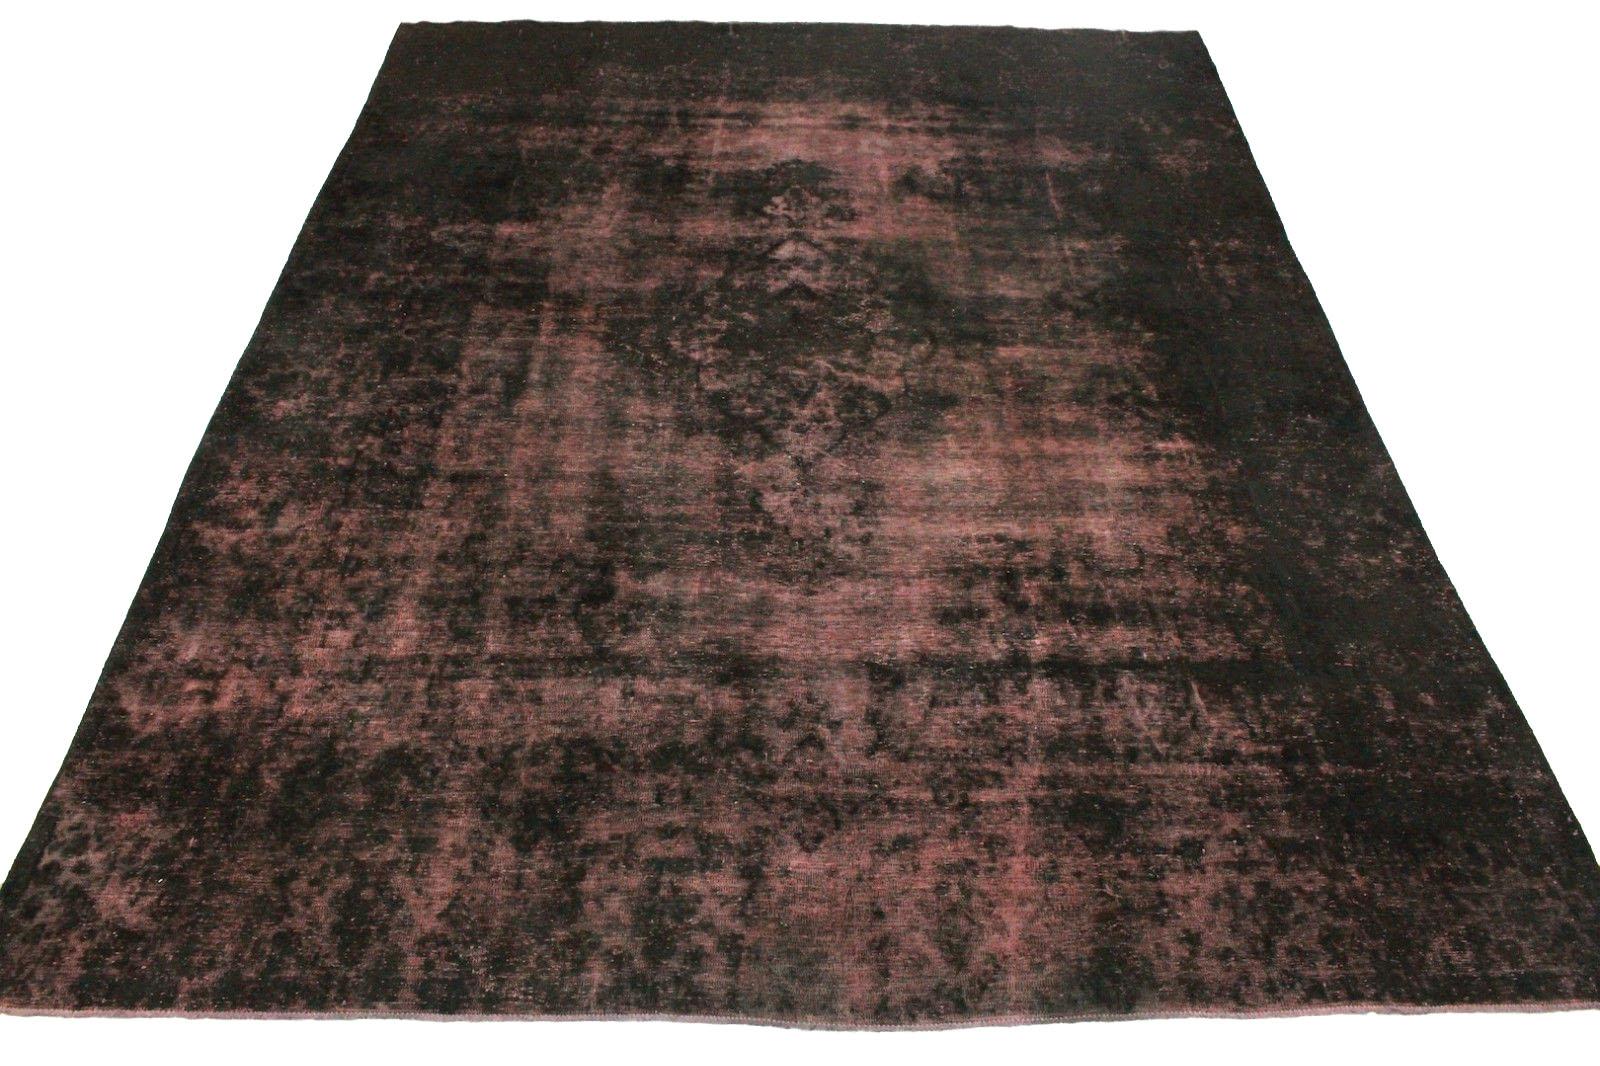 vintage teppich schwarz rosa in 400x300cm 1001 3333 bei. Black Bedroom Furniture Sets. Home Design Ideas